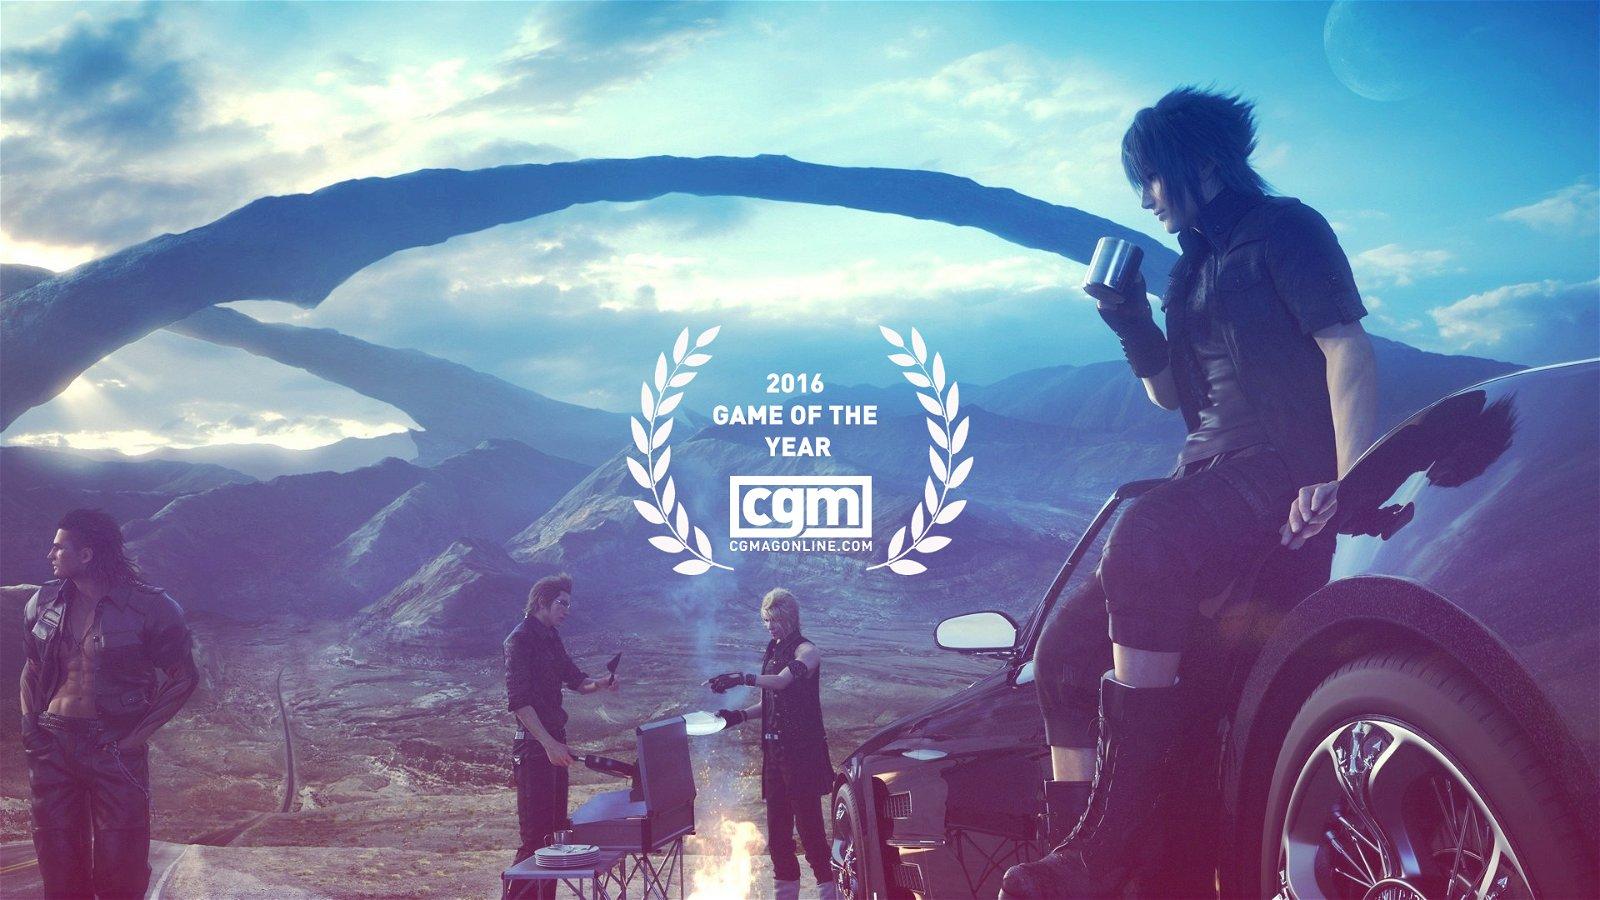 CGMagazine's Game of the Year 2016 - Final Fantasy XV 2